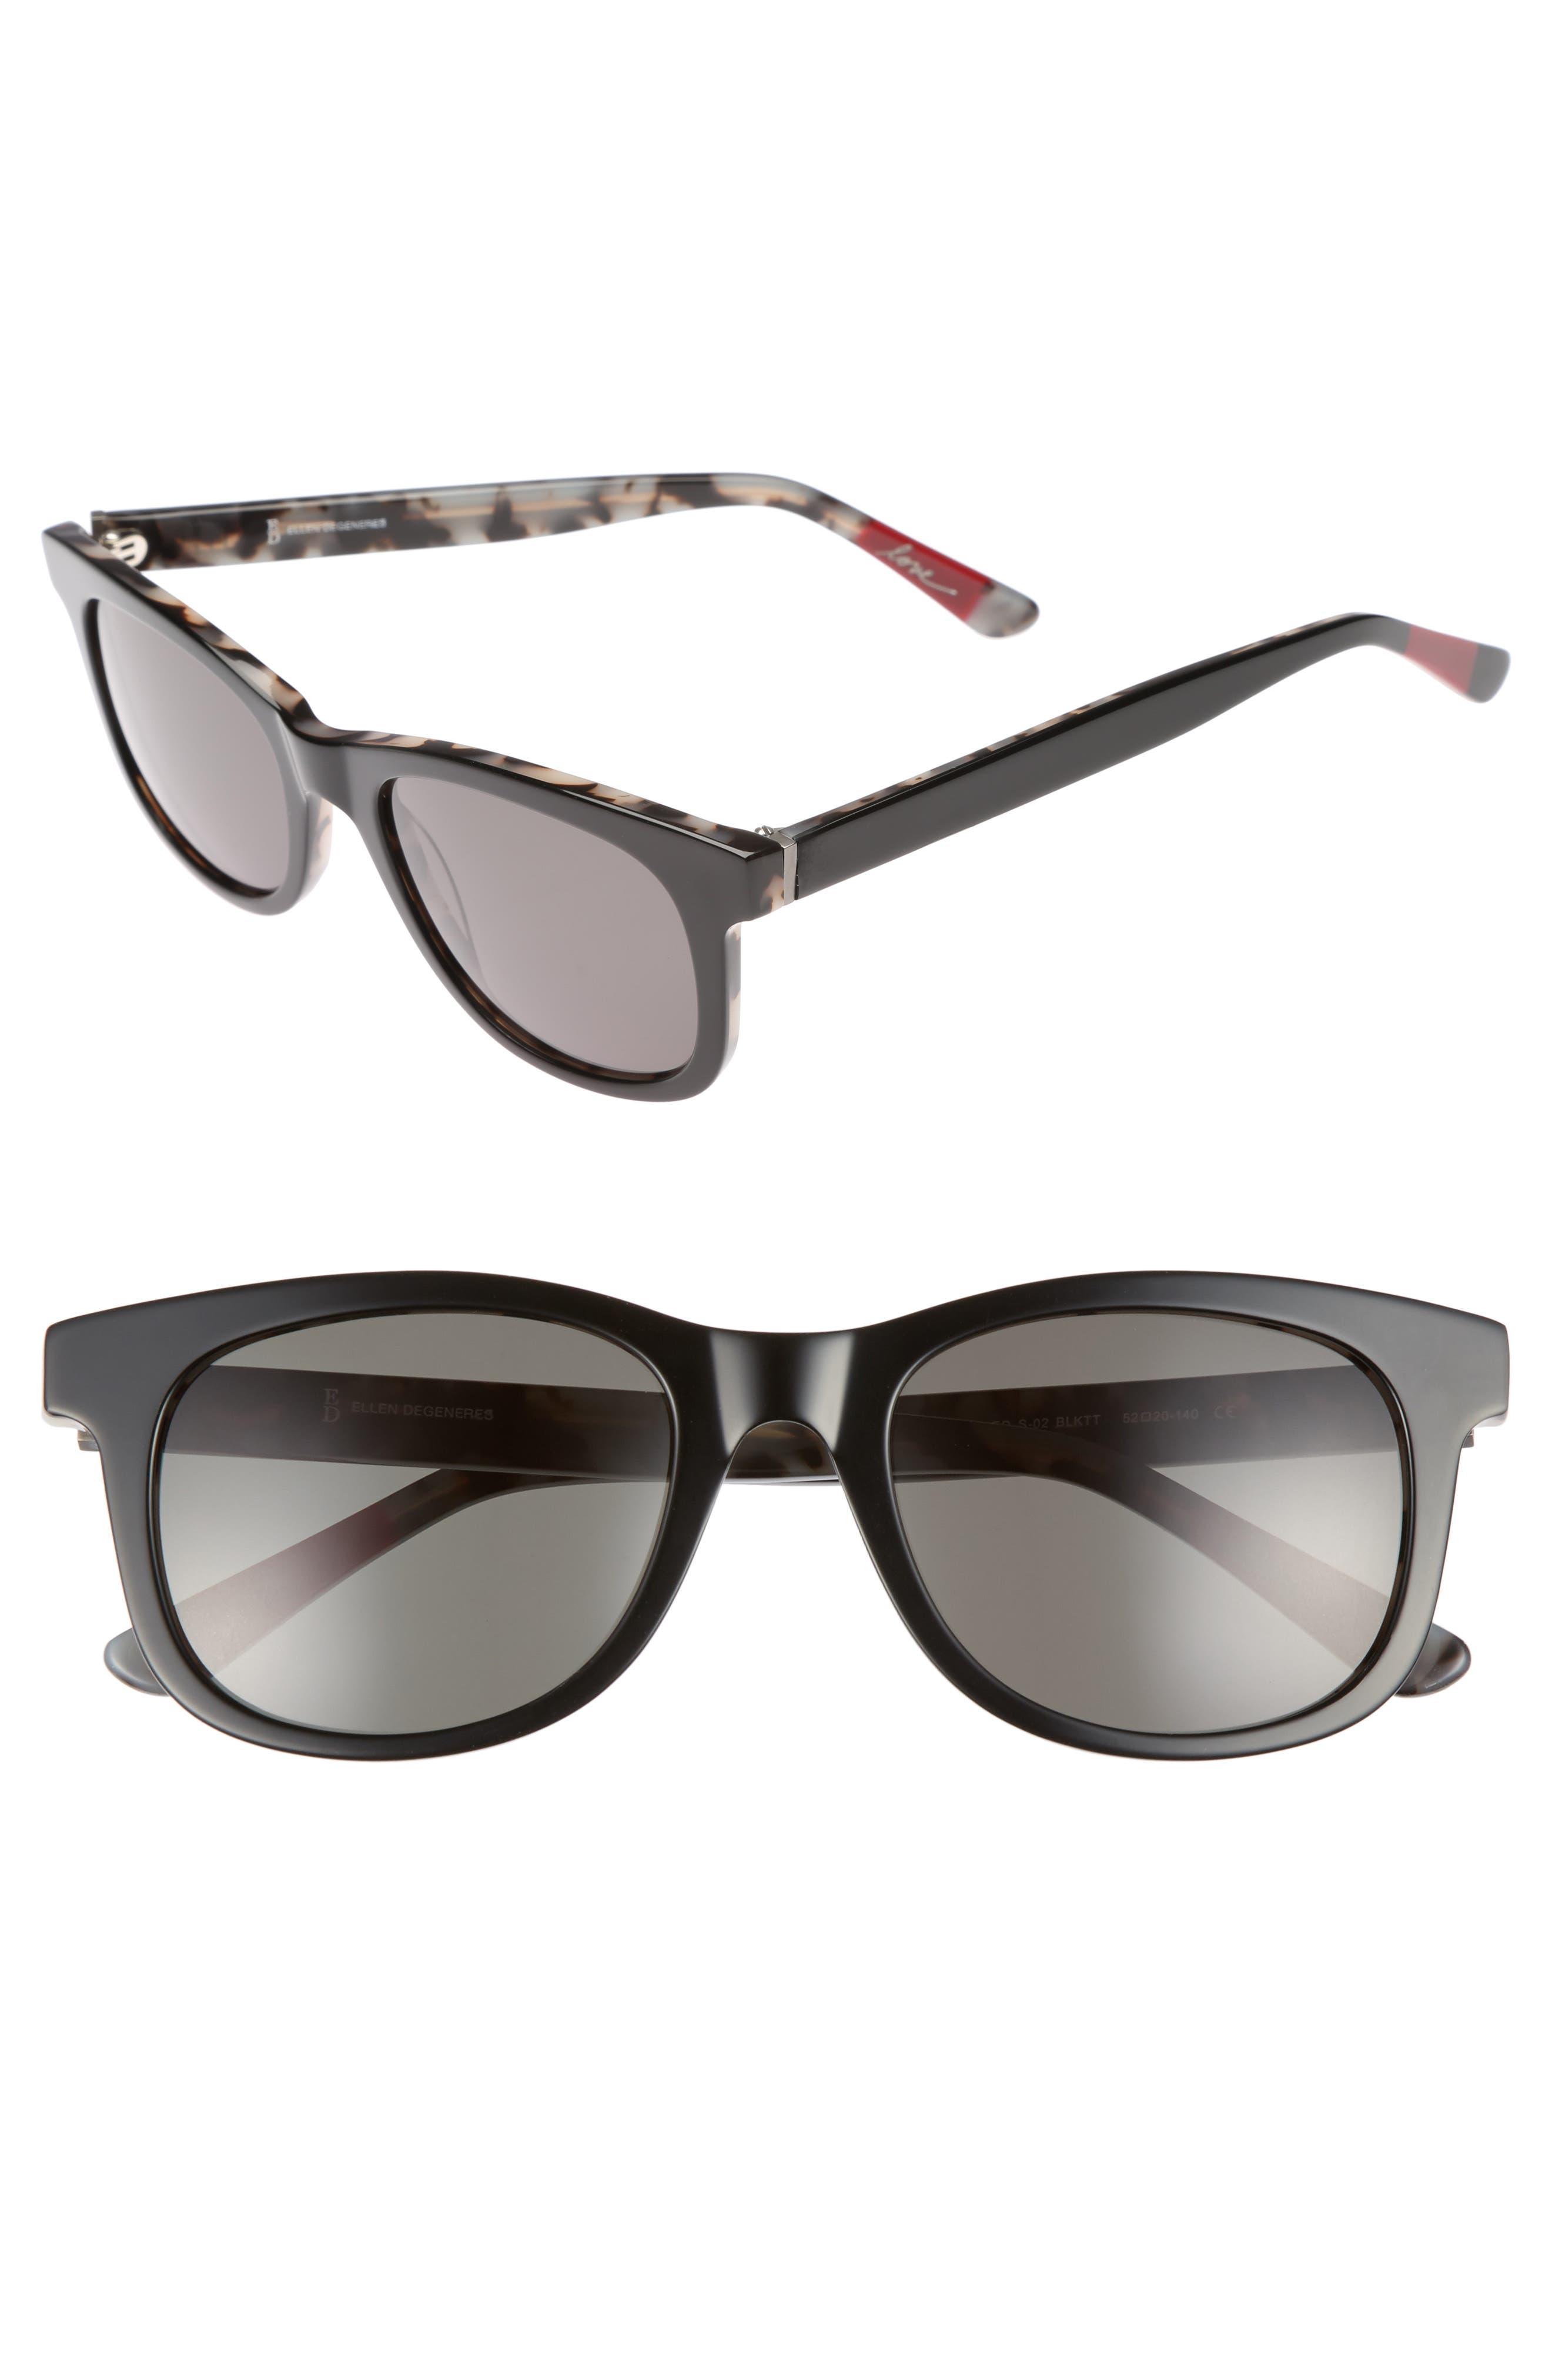 52mm Gradient Sunglasses,                         Main,                         color, Black Tortoise